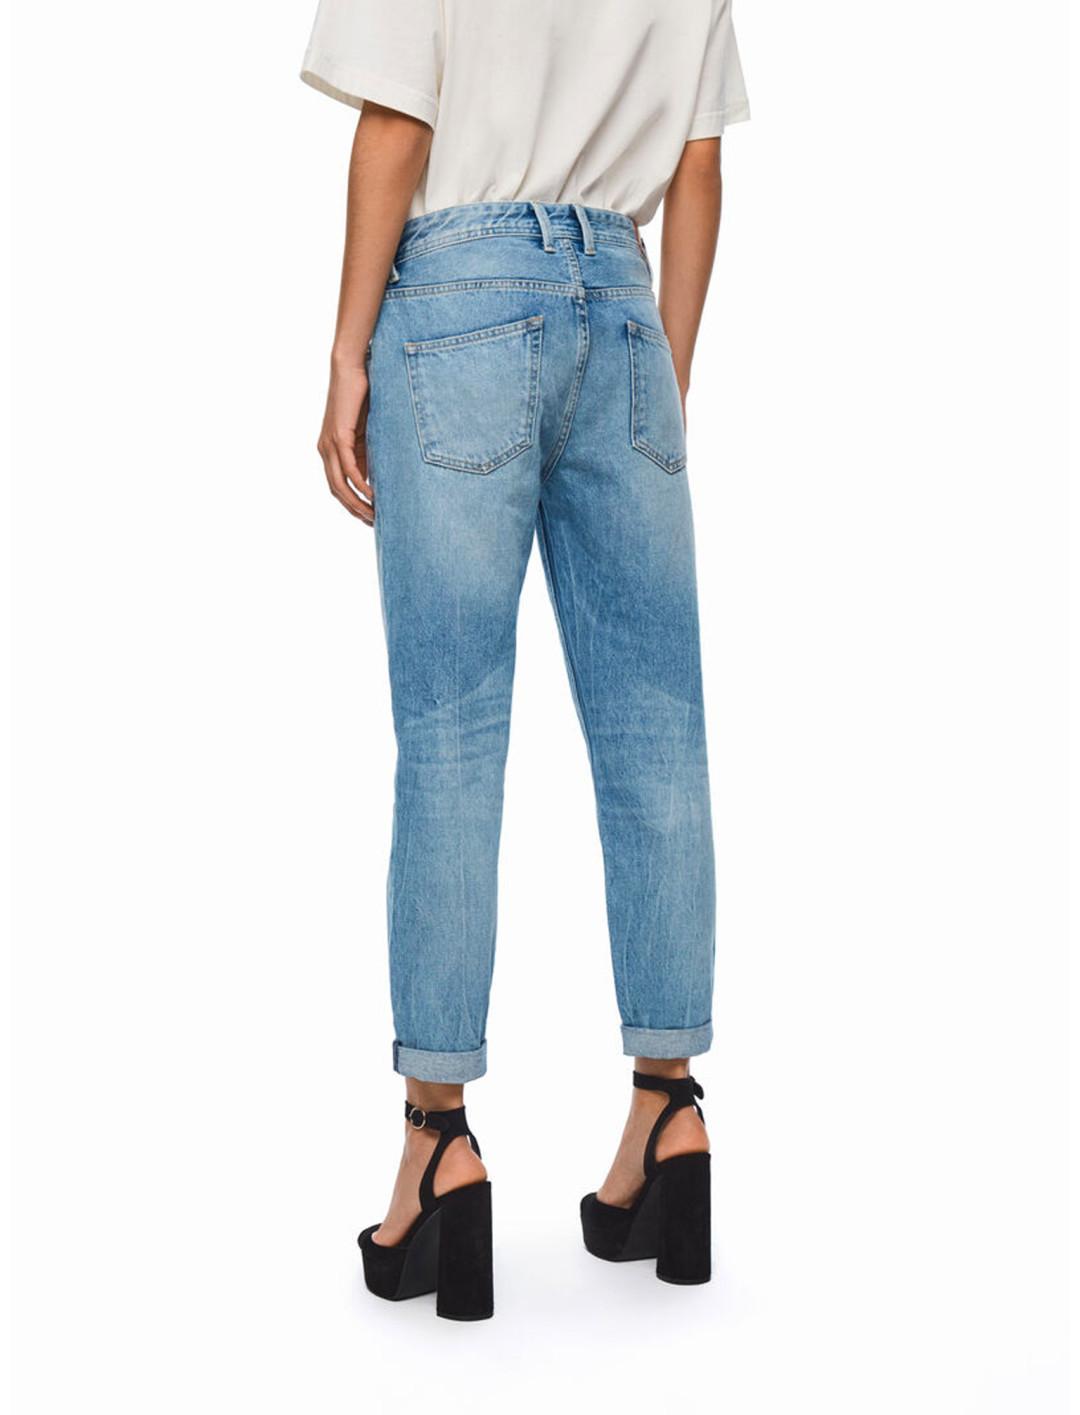 Blue Jeans Clothing Pepe Jeans x Dua Lipa